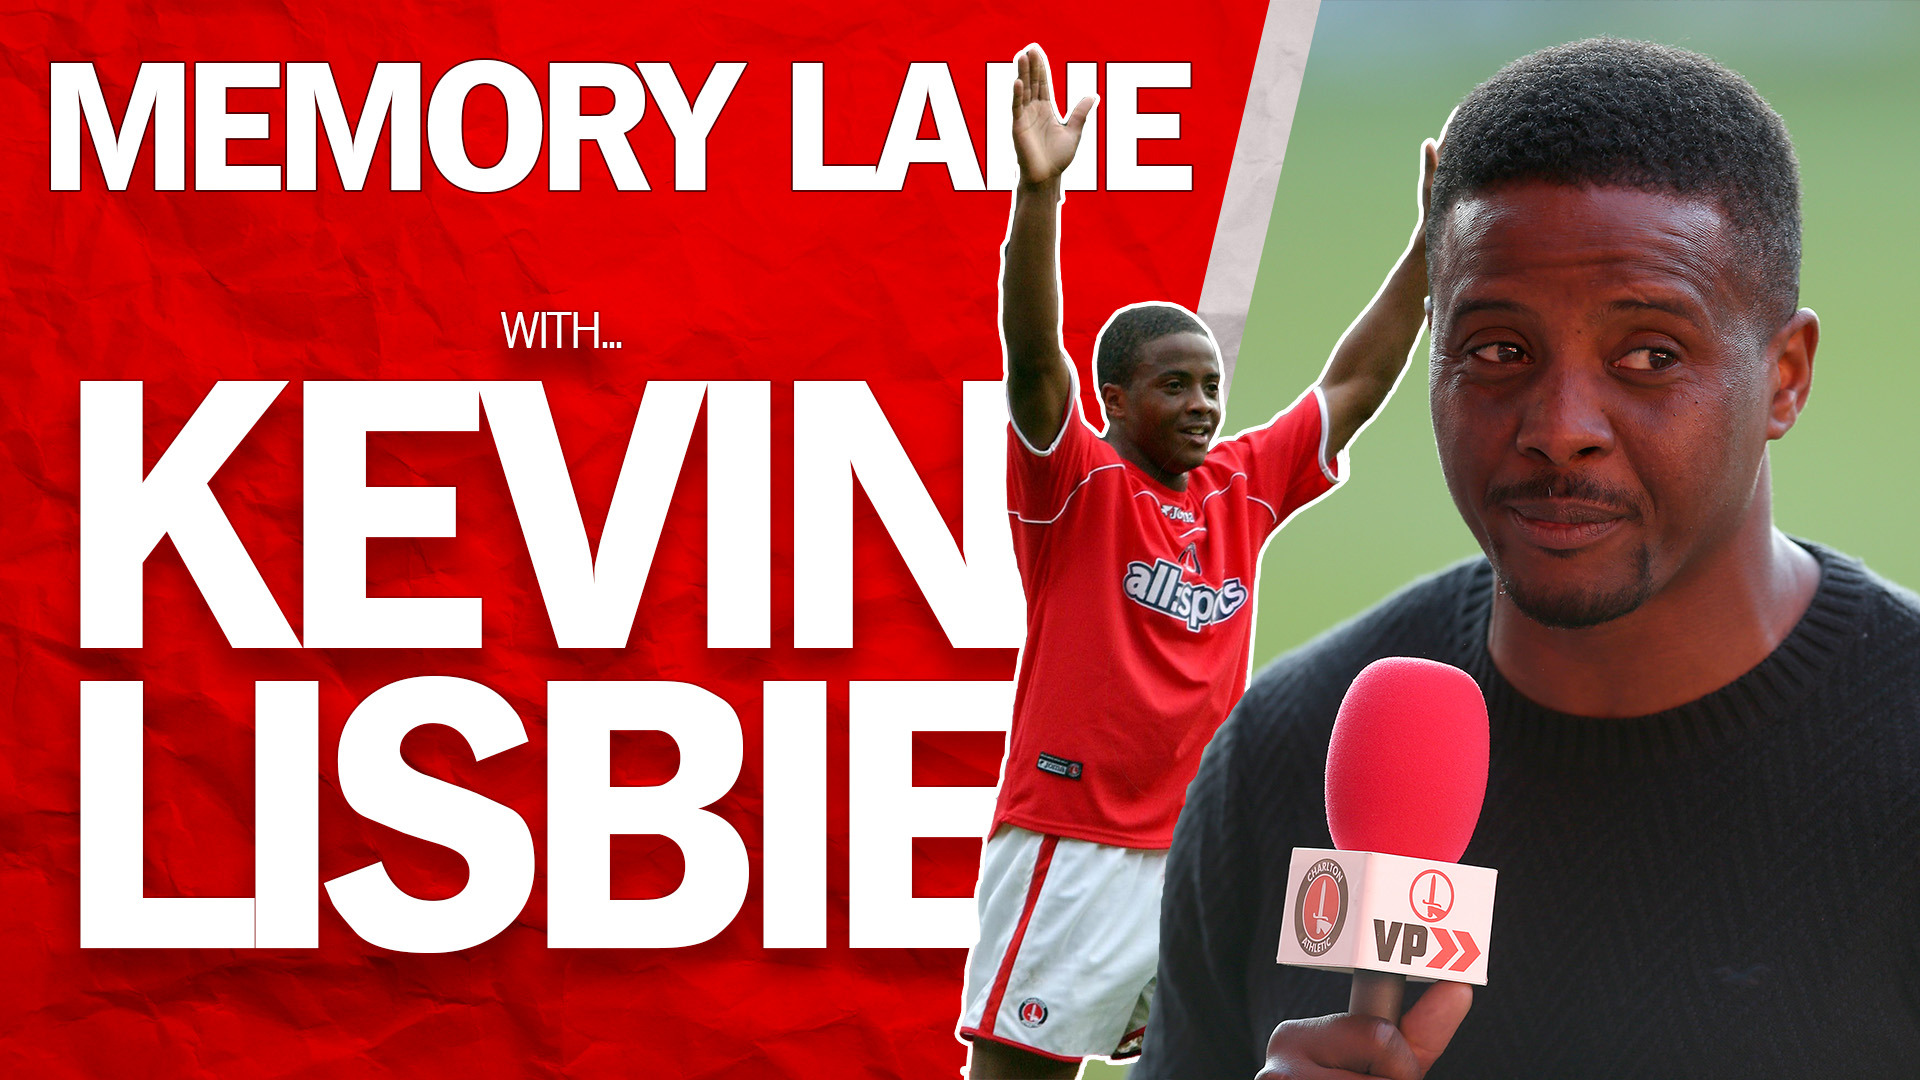 MEMORY LANE | Kevin Lisbie (Feb 21)